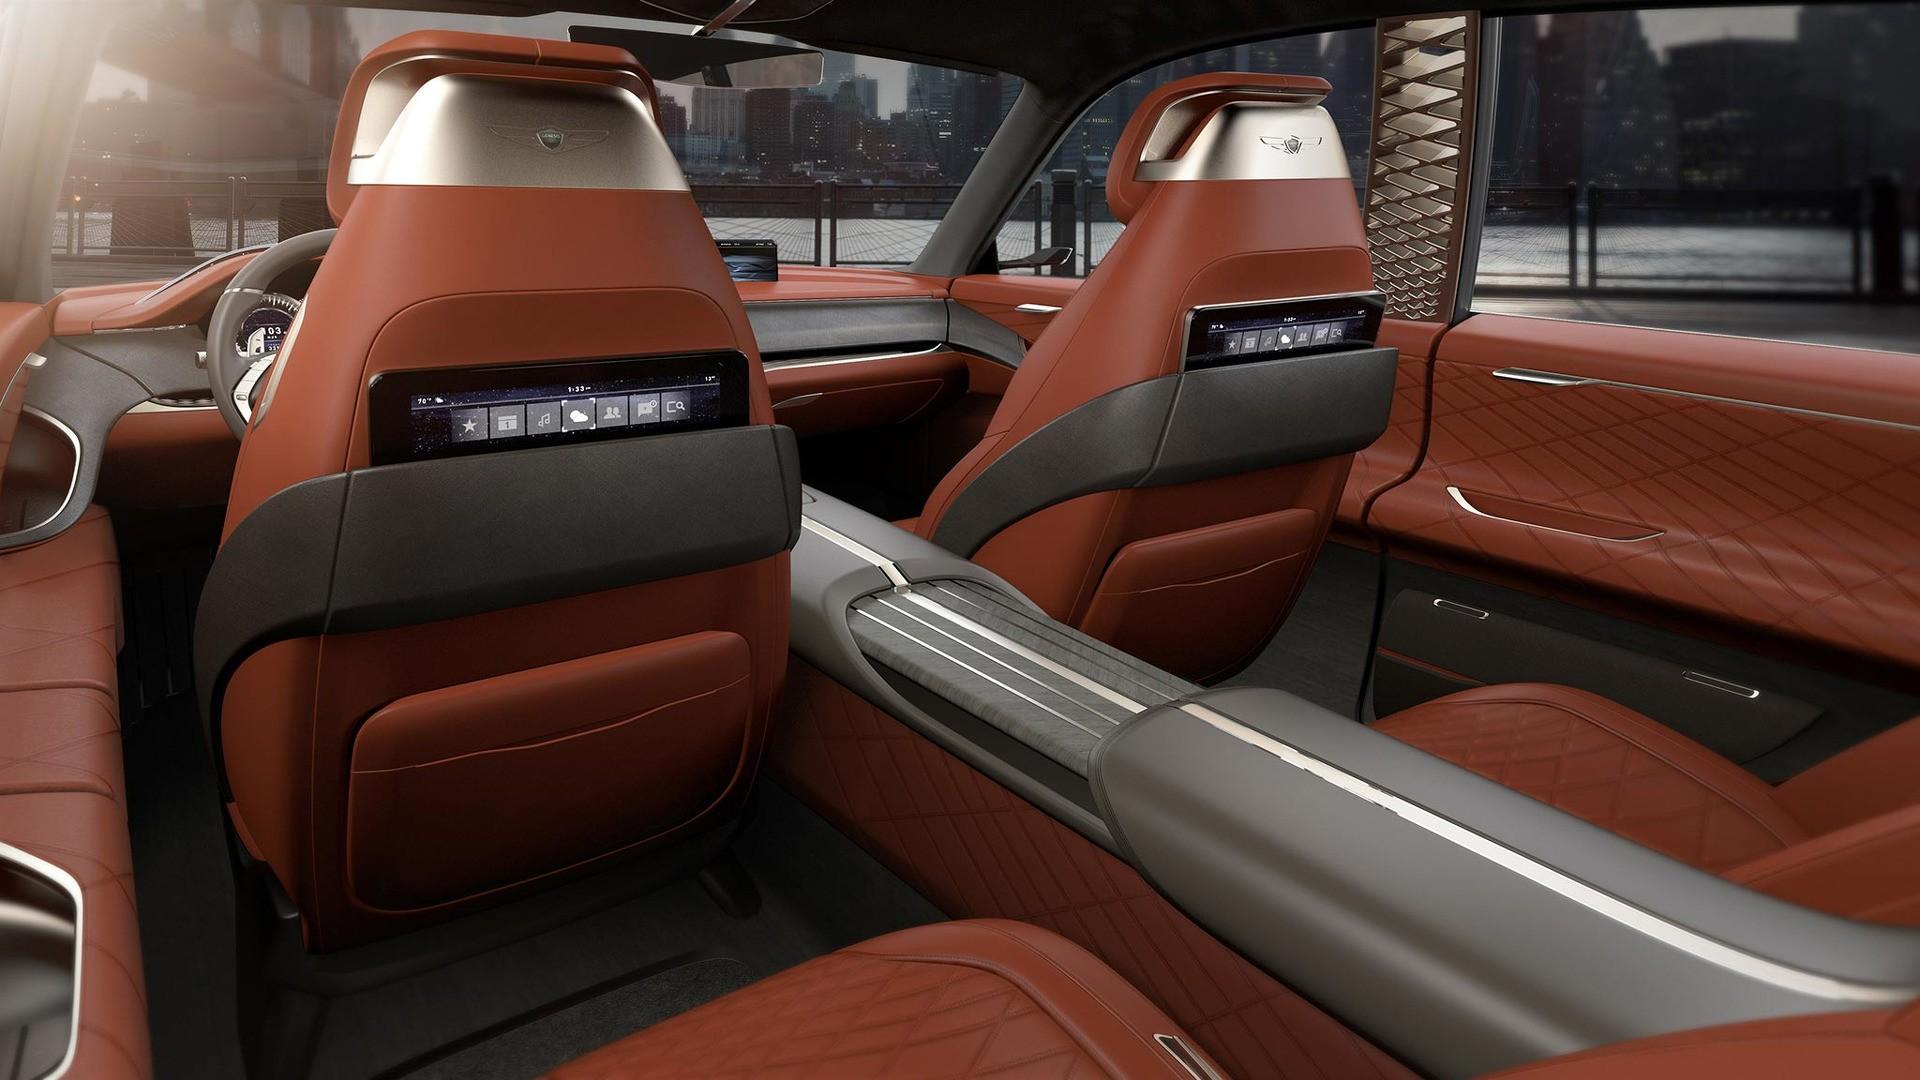 New Mercedes Suv >> Spyshots: 2020 Genesis GV80 SUV Testing to Kickstart ...